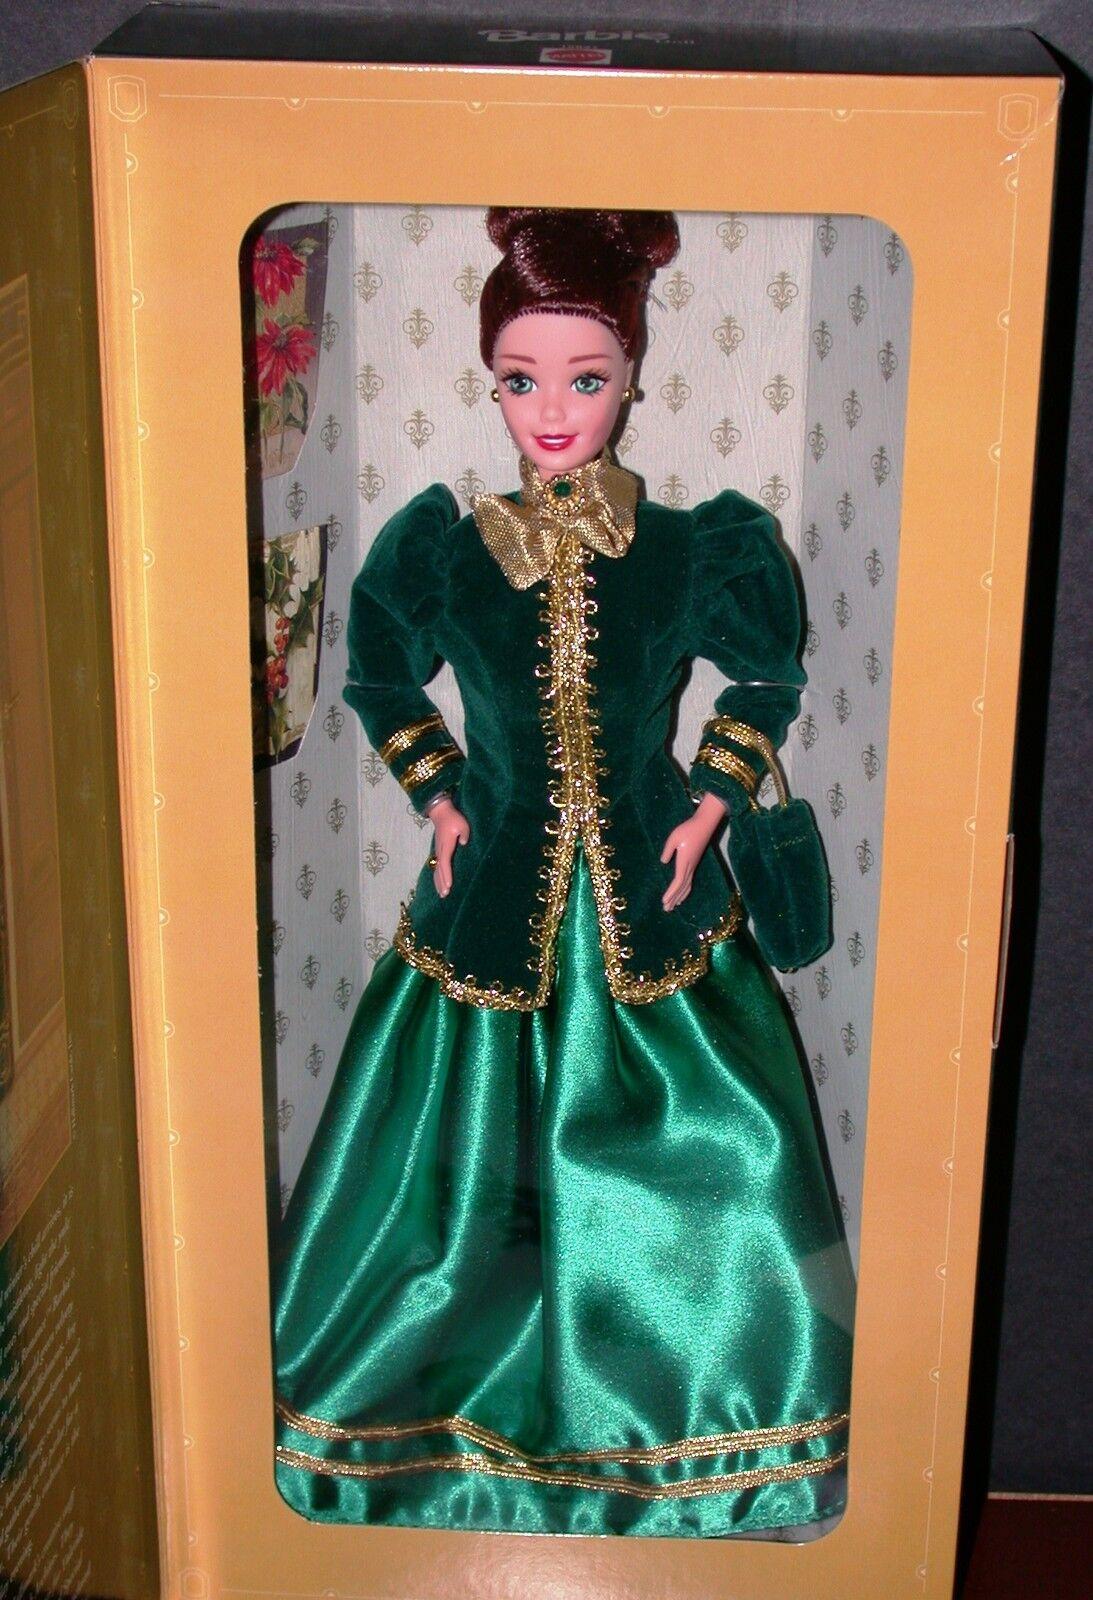 1996 Yuletide Romance Barbie Hallmark Special Edition Victorian Dress 15621